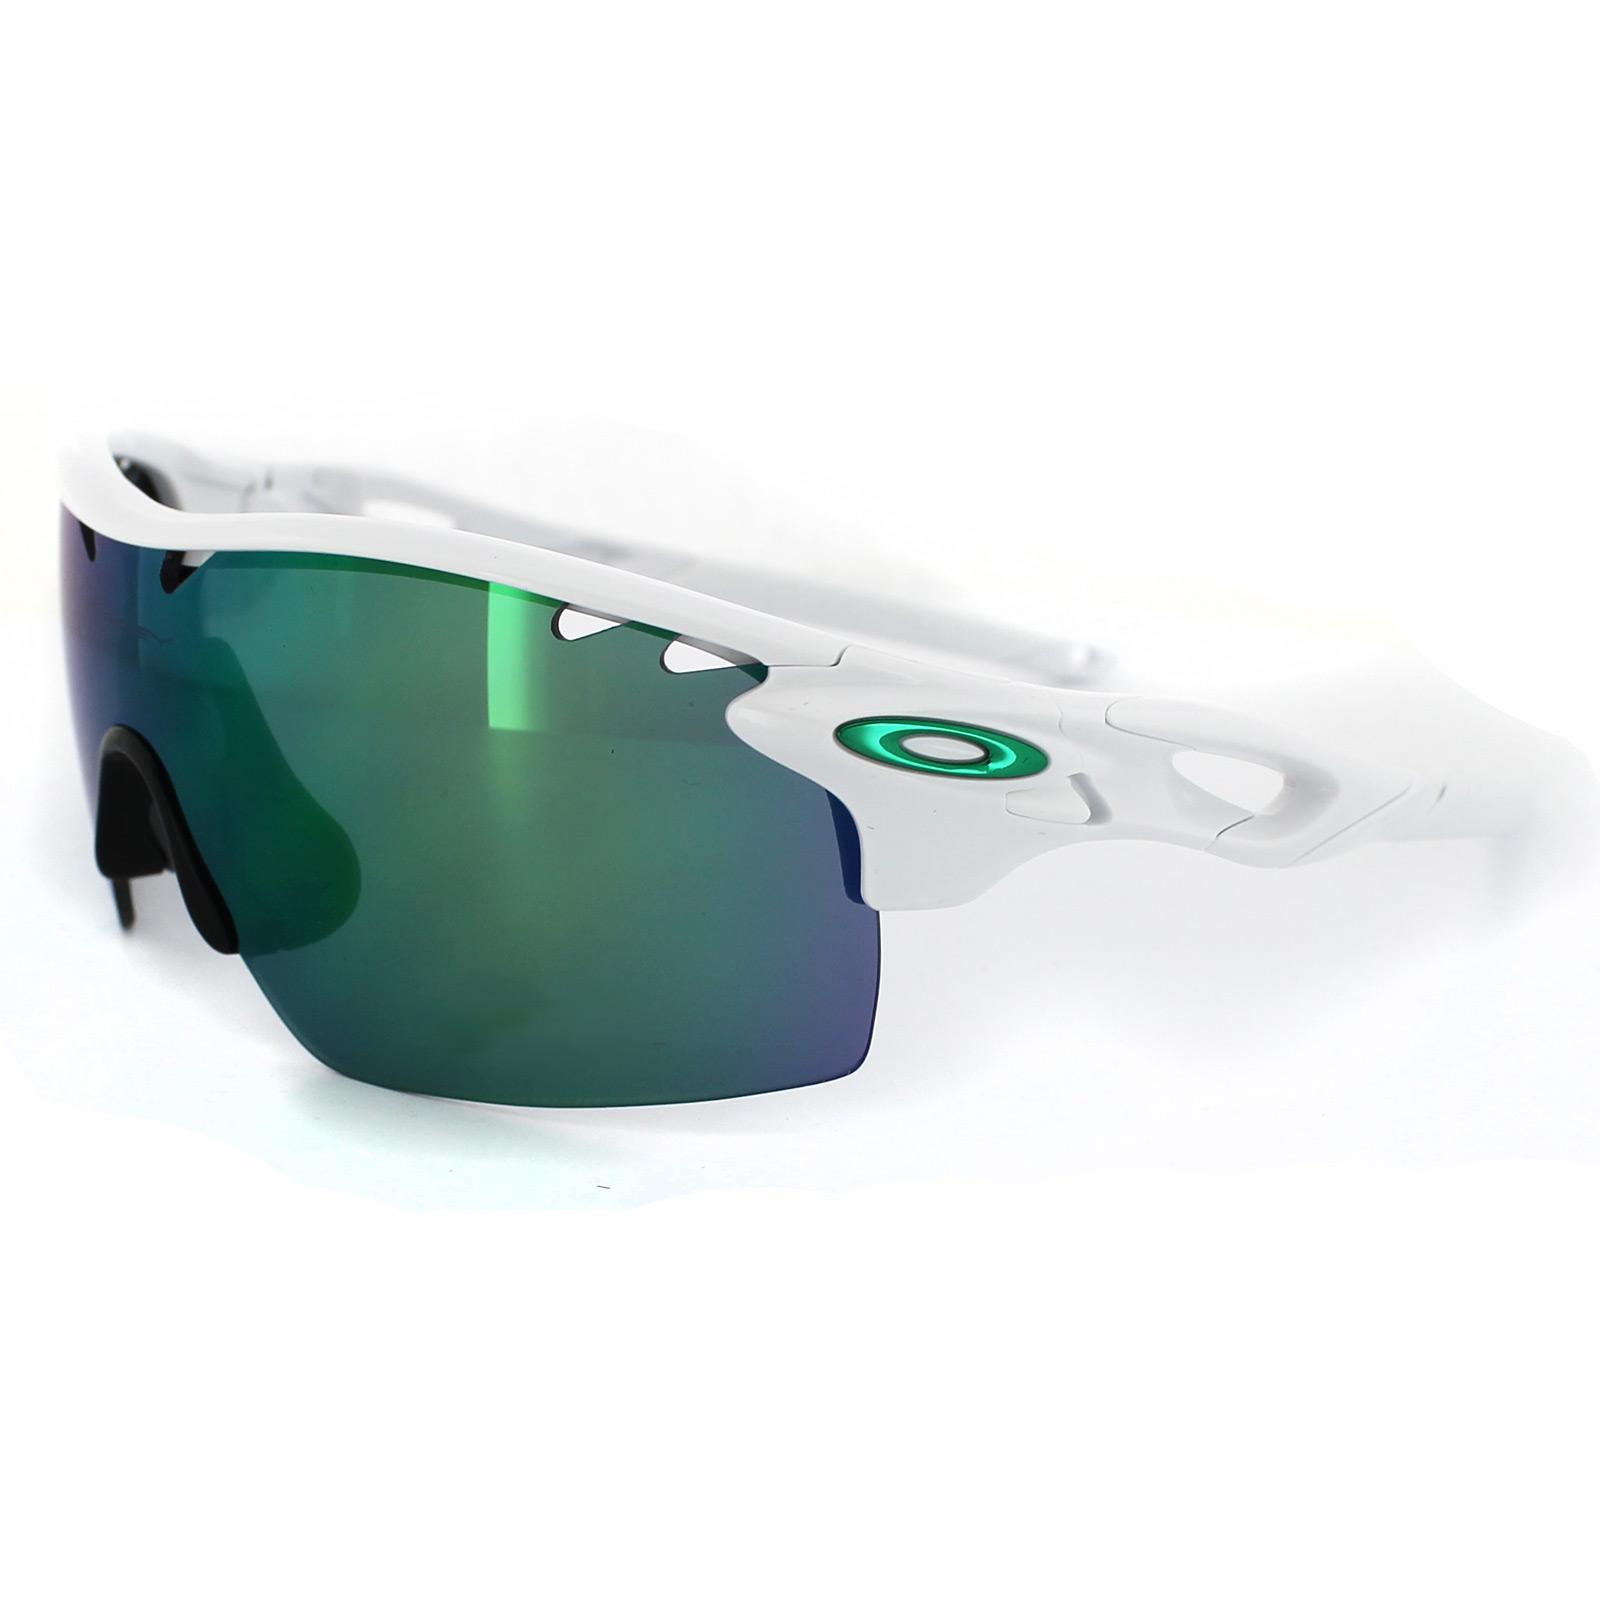 73b0bec606 Cheap Oakley Radarlock XL Sunglasses - Discounted Sunglasses